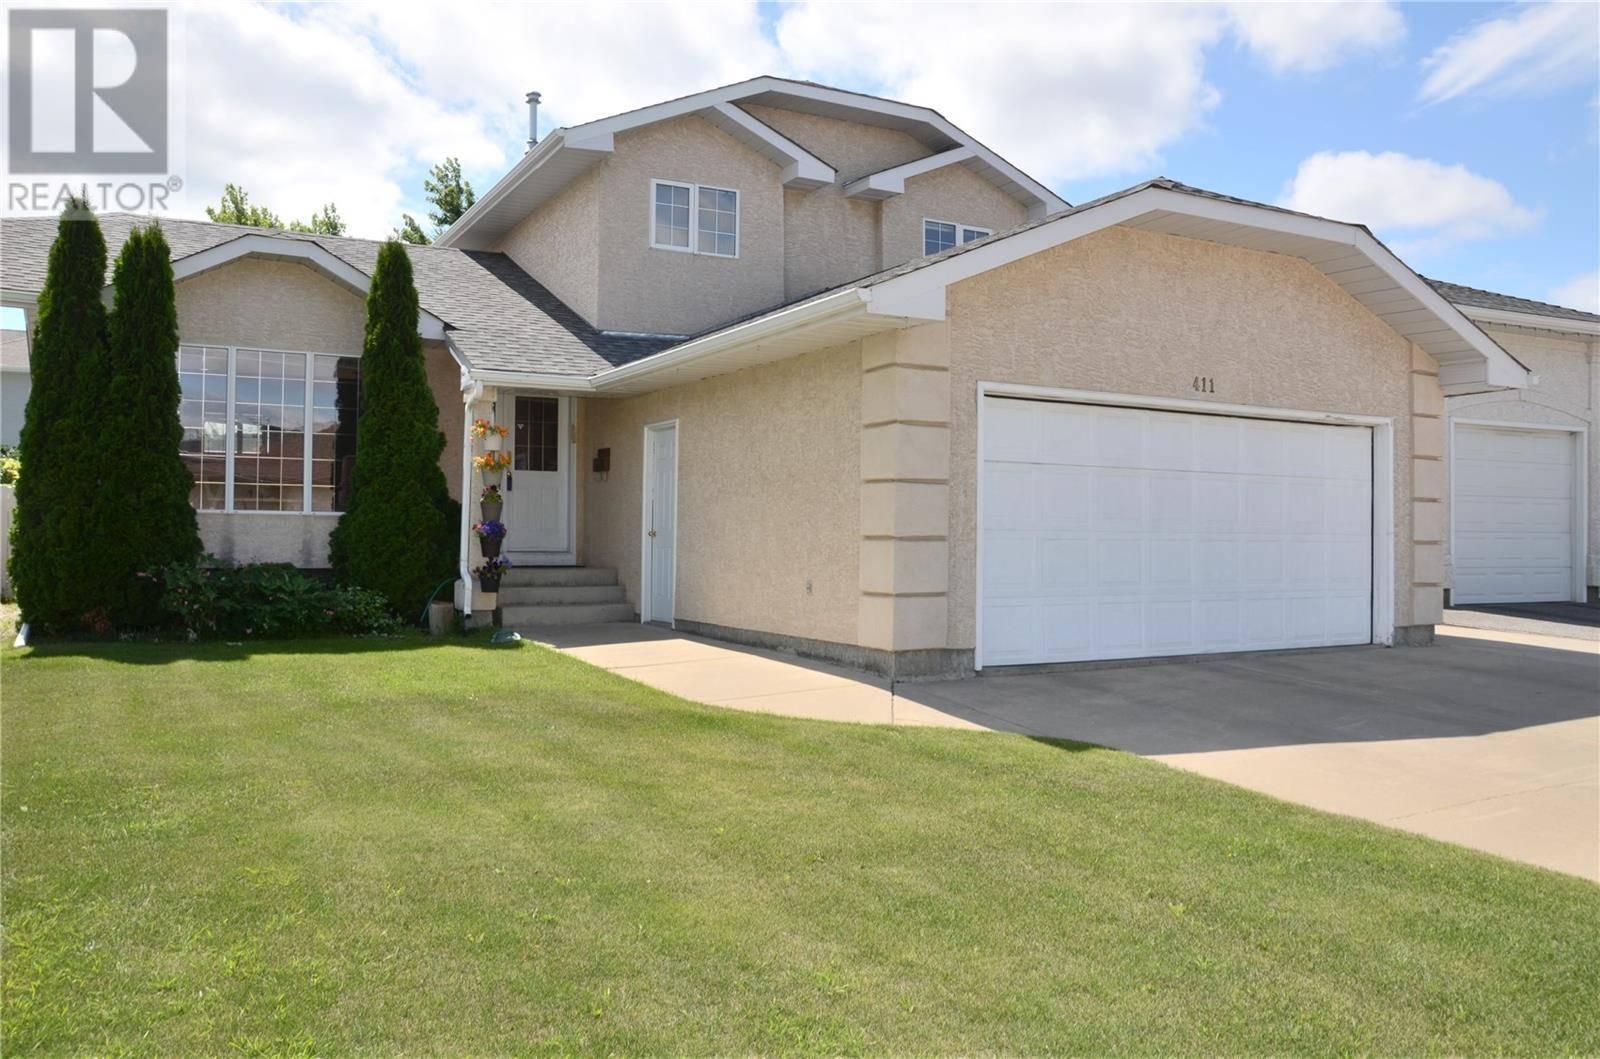 House for sale at 411 Blackshire Cres Saskatoon Saskatchewan - MLS: SK779156